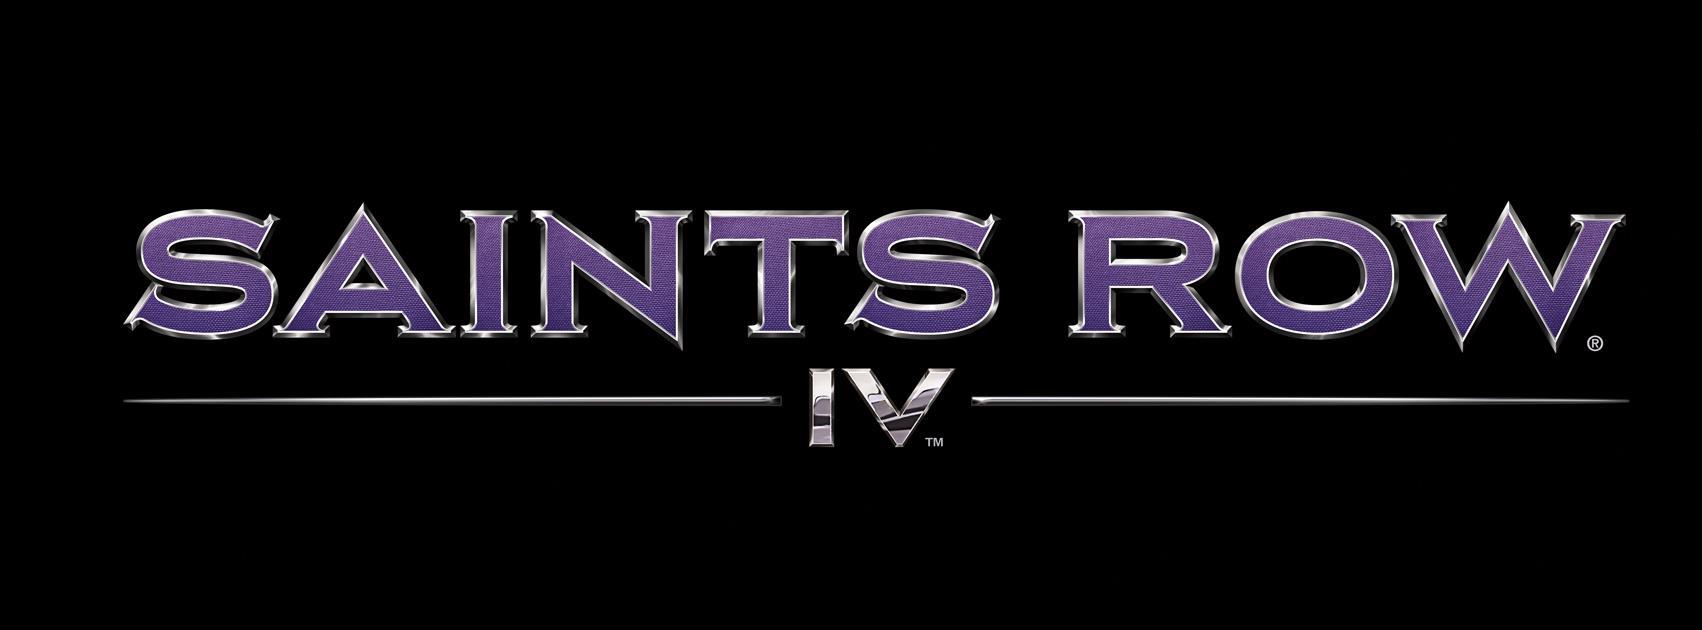 Saints-Row-4-logo